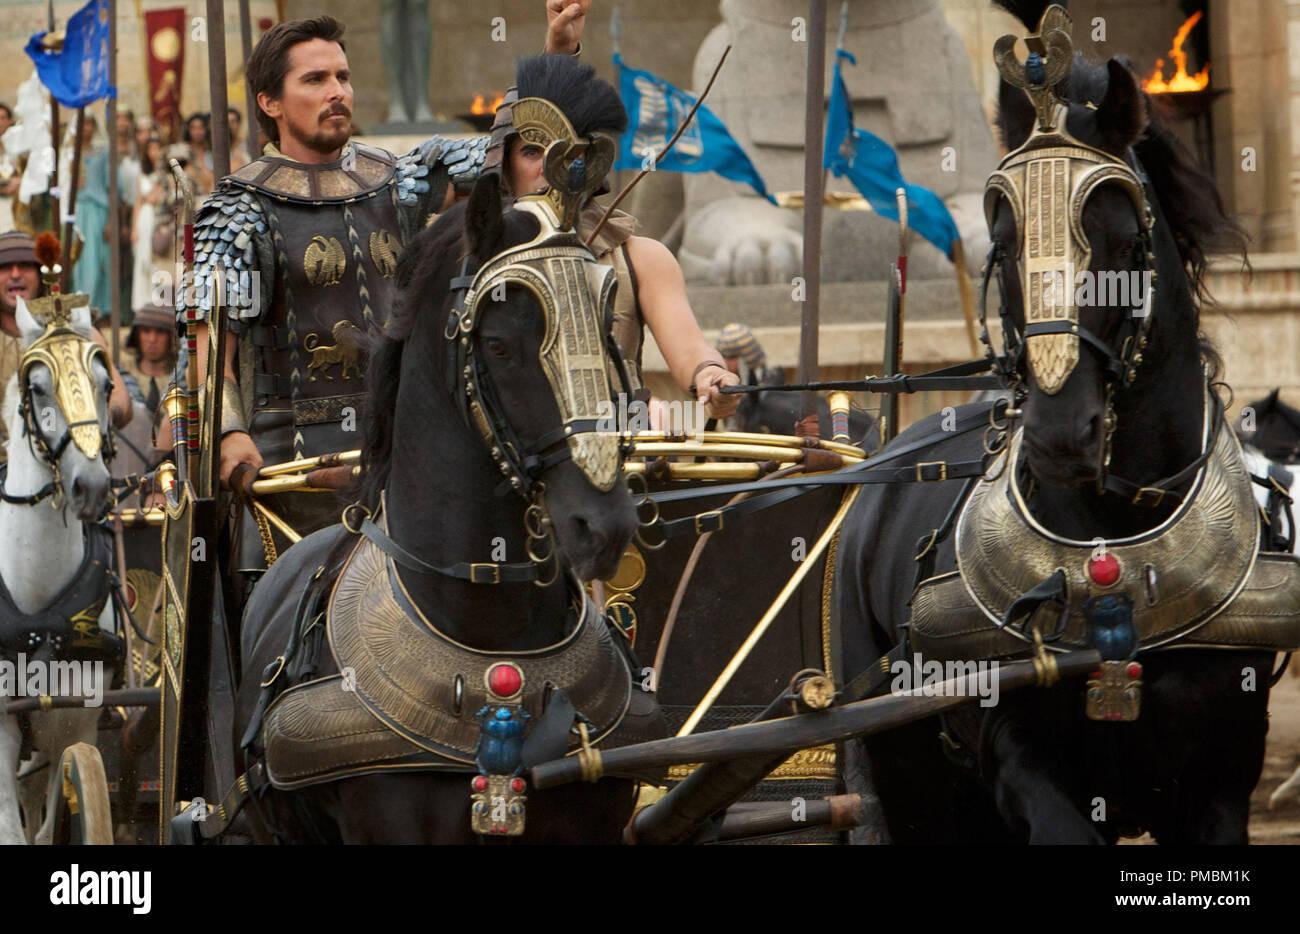 'Exodus: Gods and Kings' (2014) Moses (Christian Bale) rides triumphantly into battle. - Stock Image